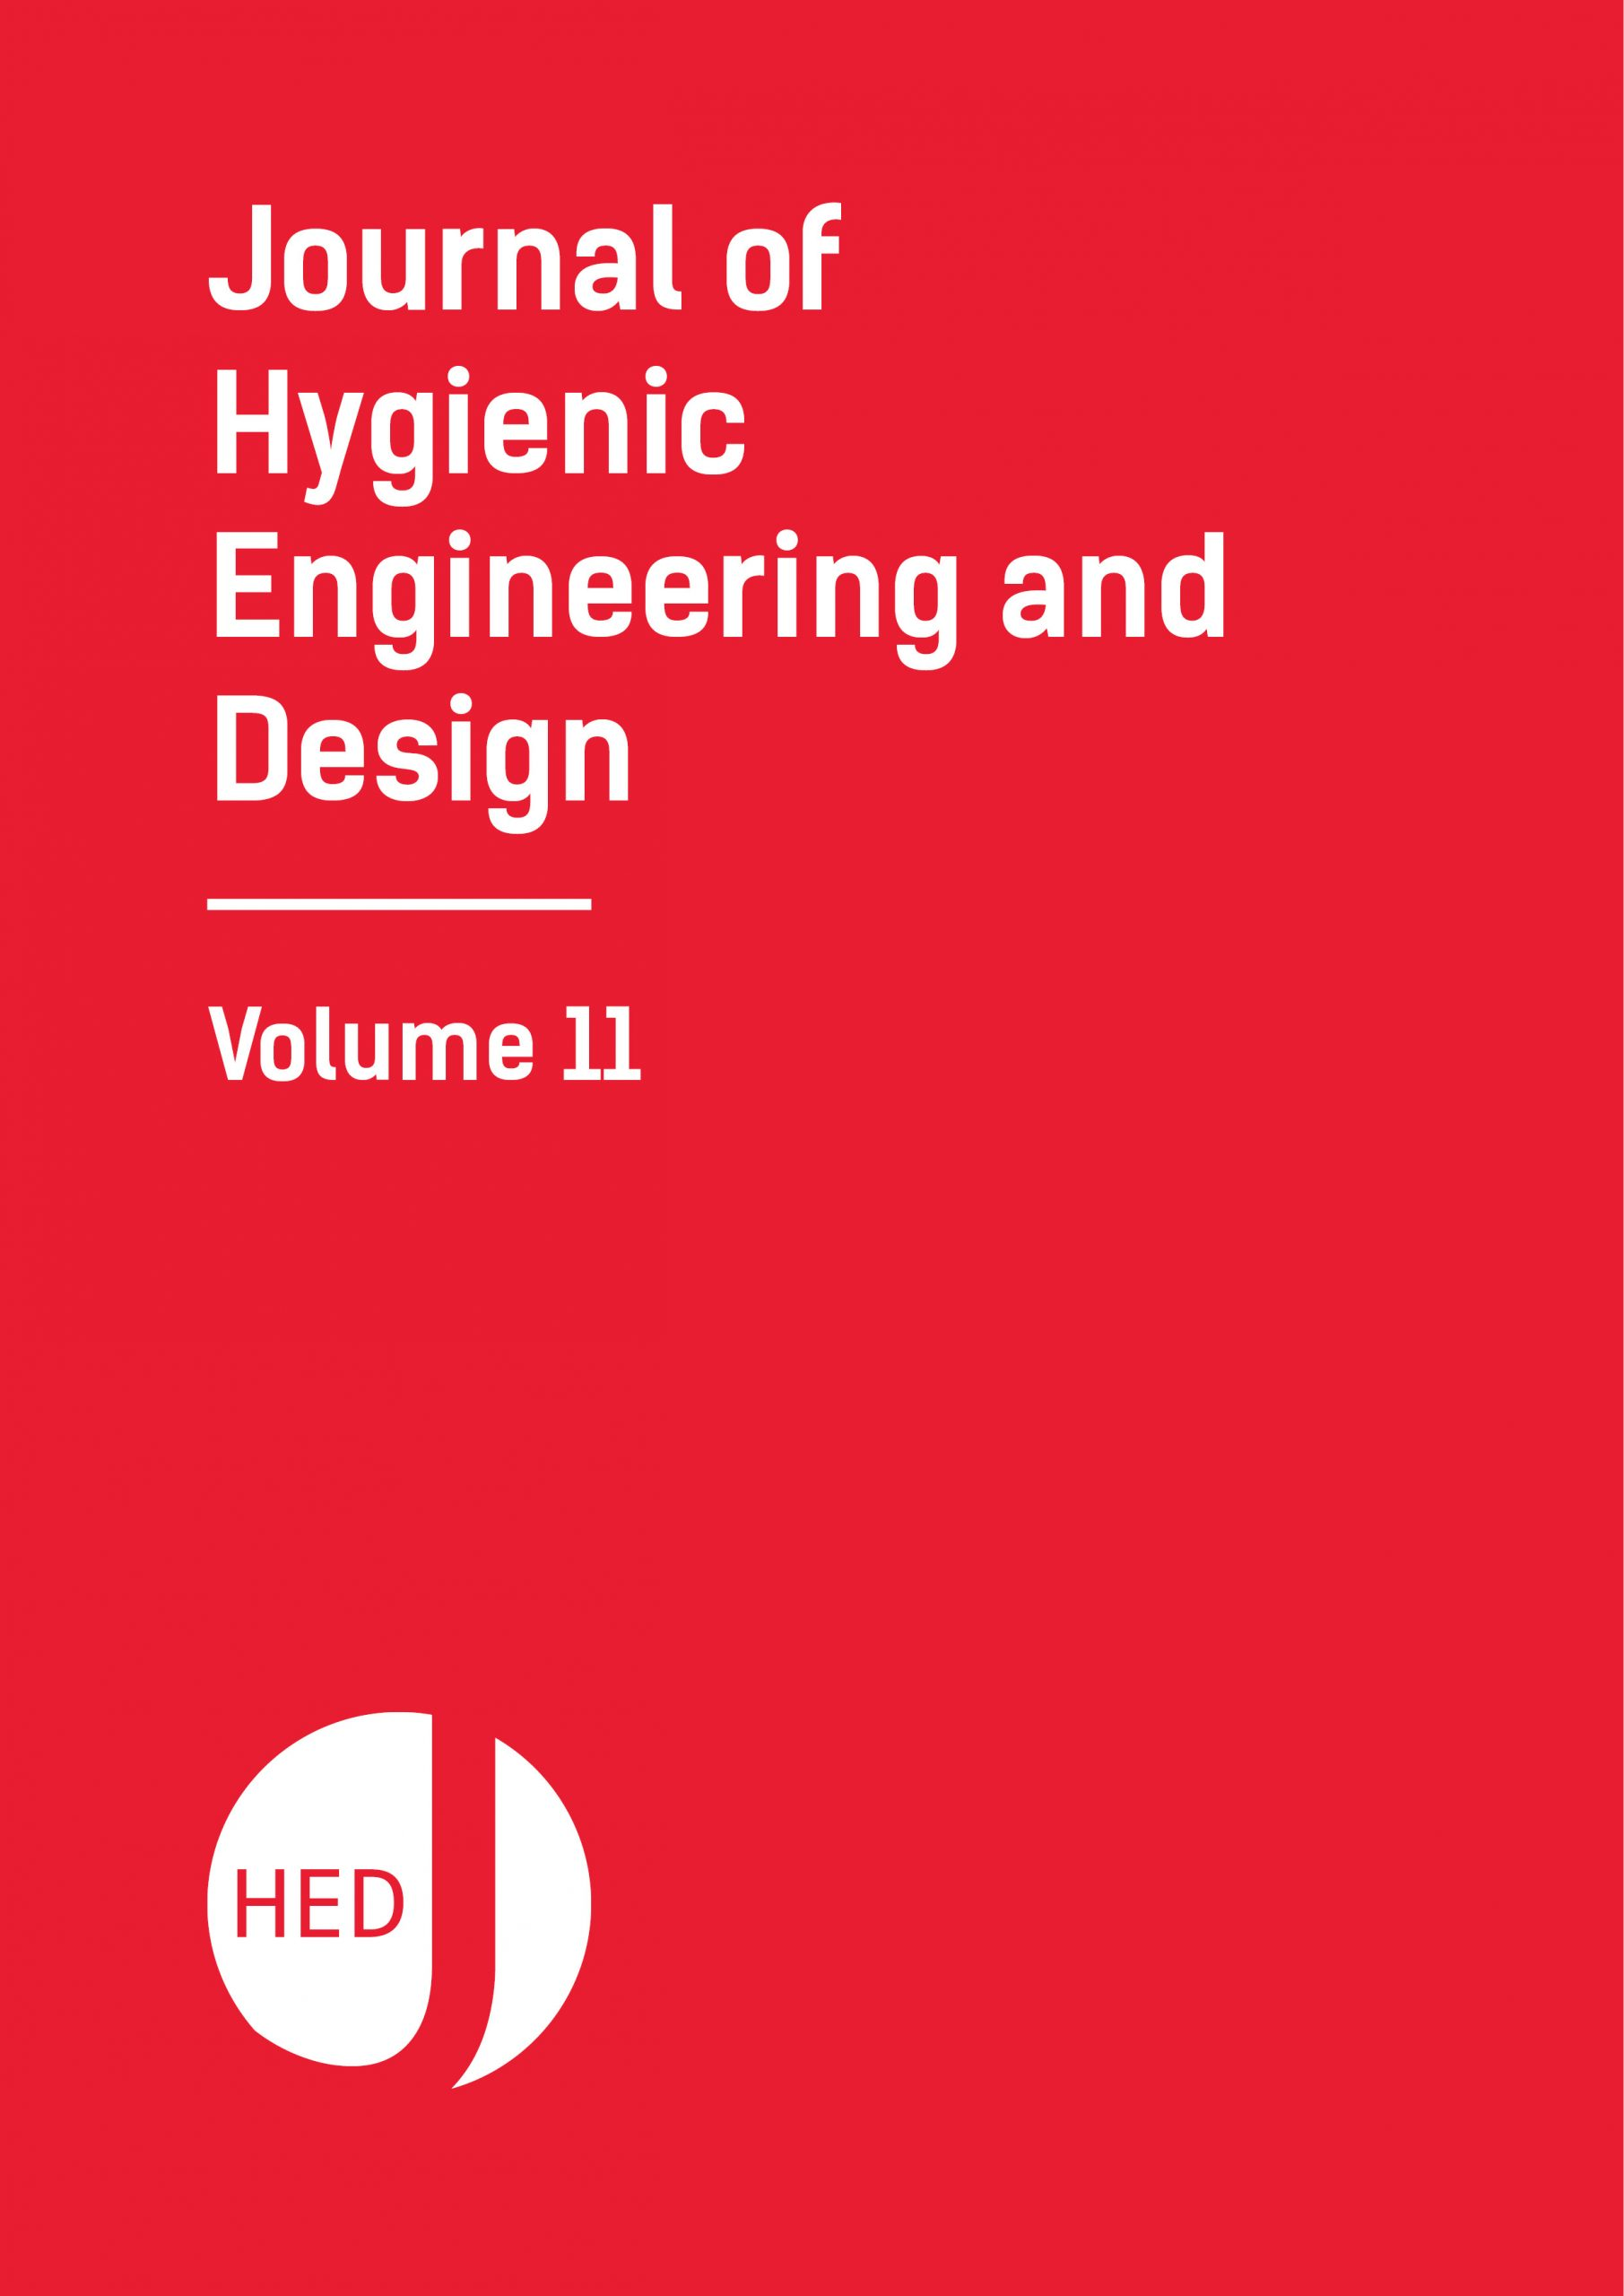 JHED Volume 11